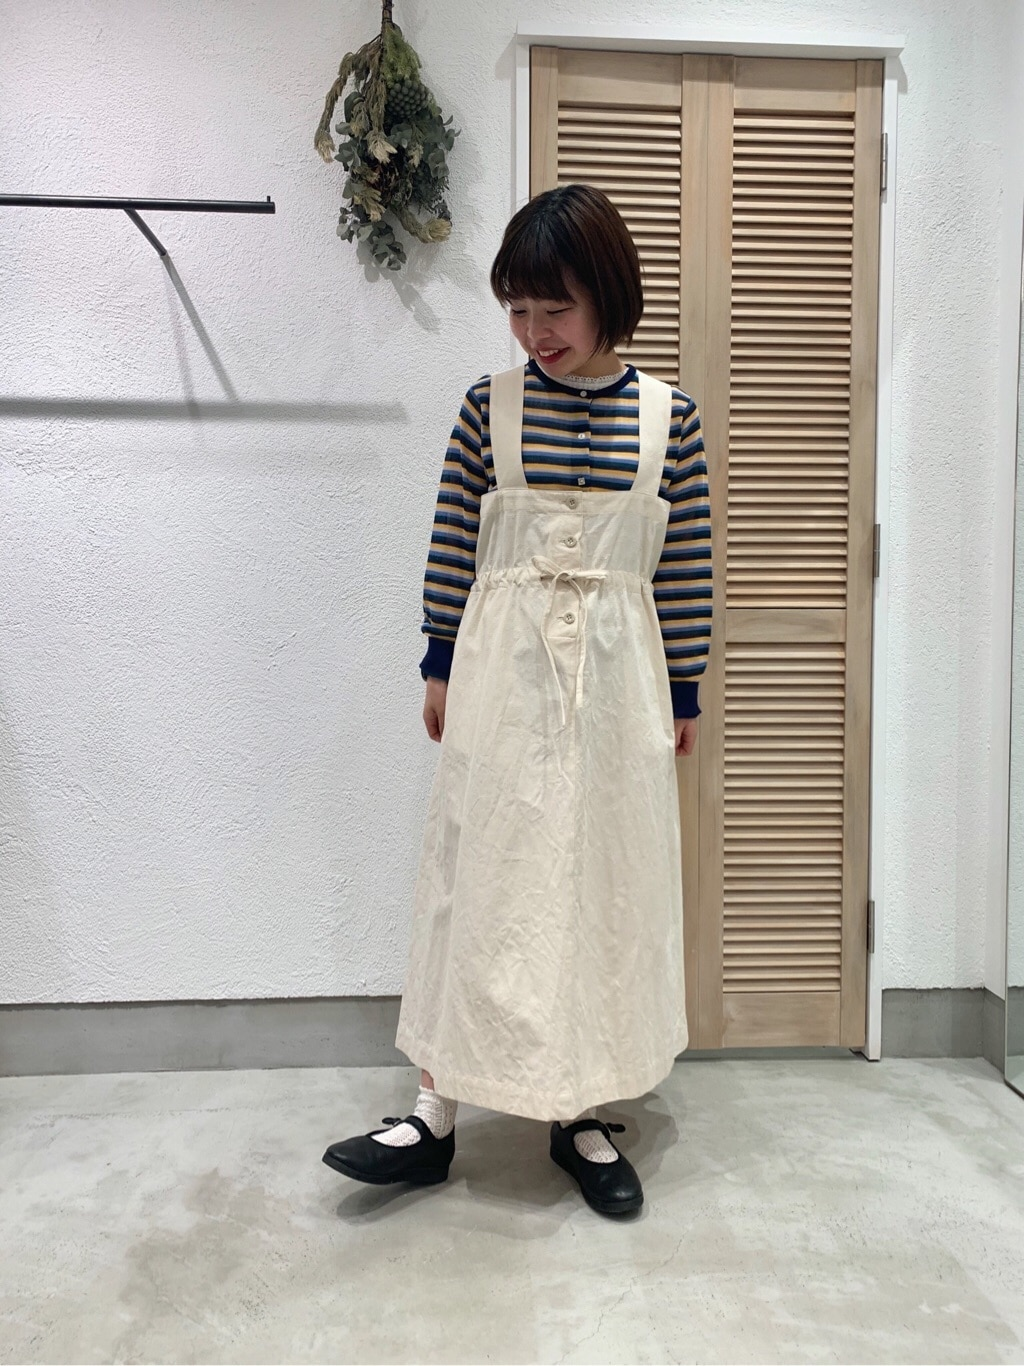 chambre de charme 横浜ジョイナス 身長:153cm 2020.04.12